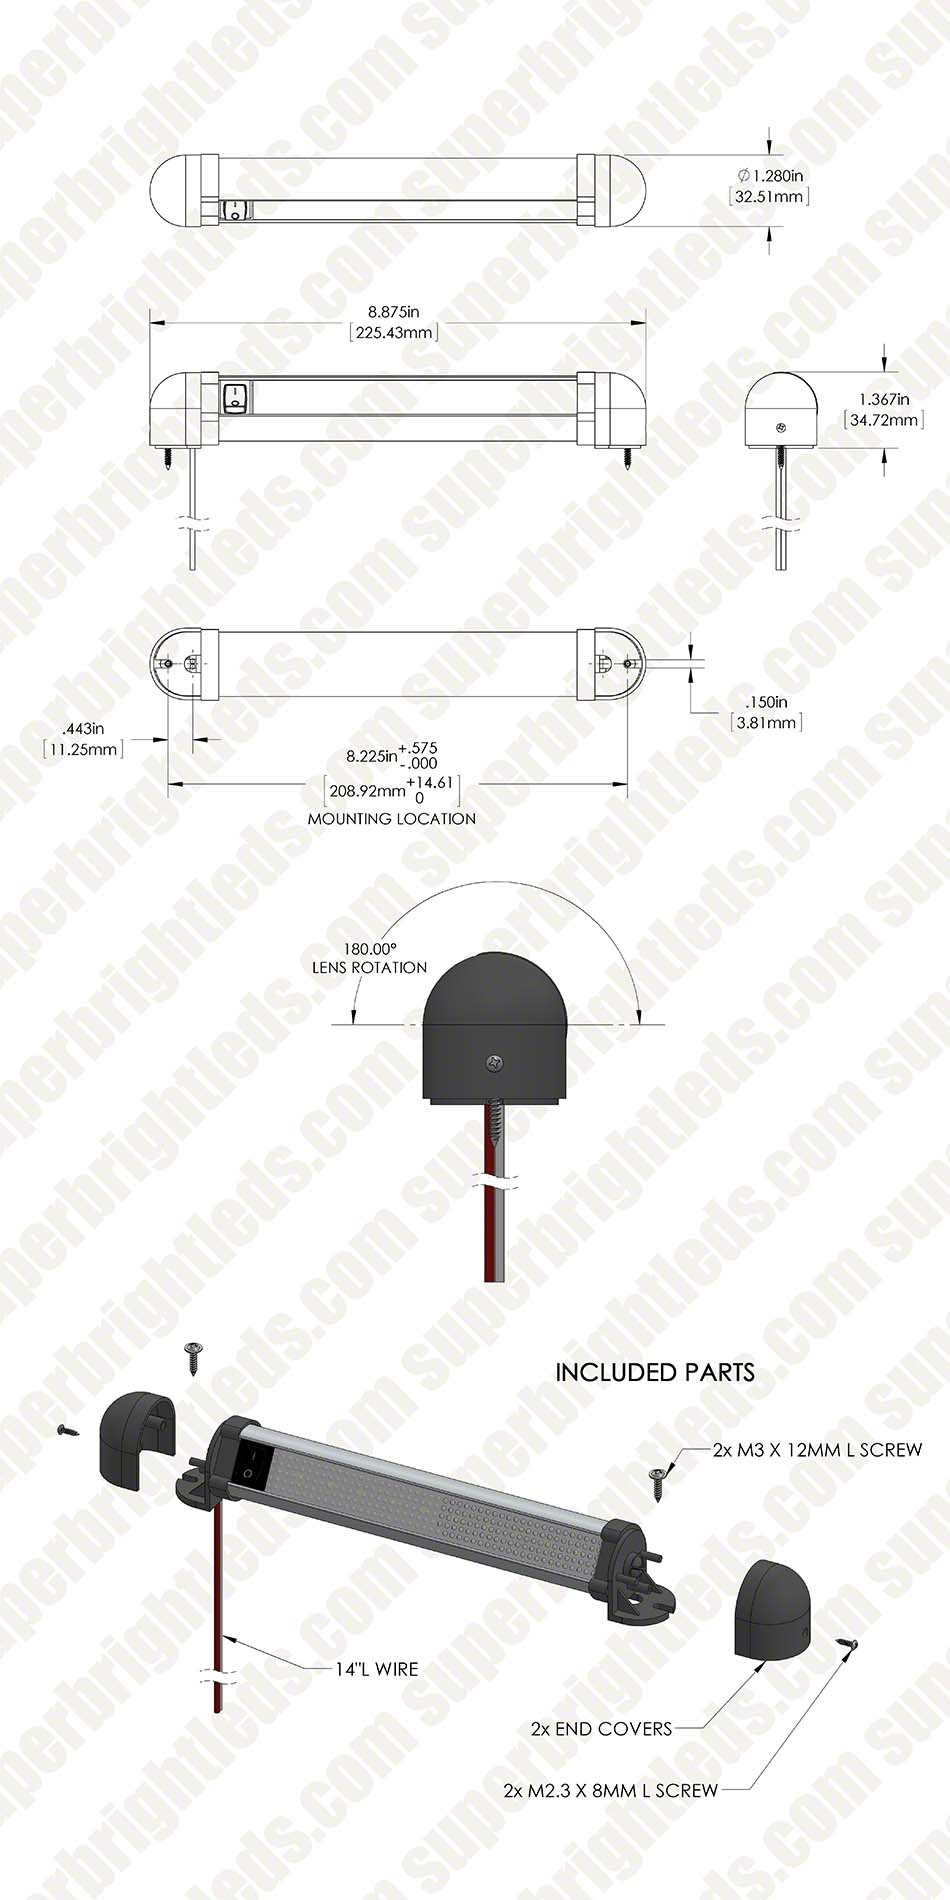 9 u0026quot  swivel utility led light bar with rocker switch